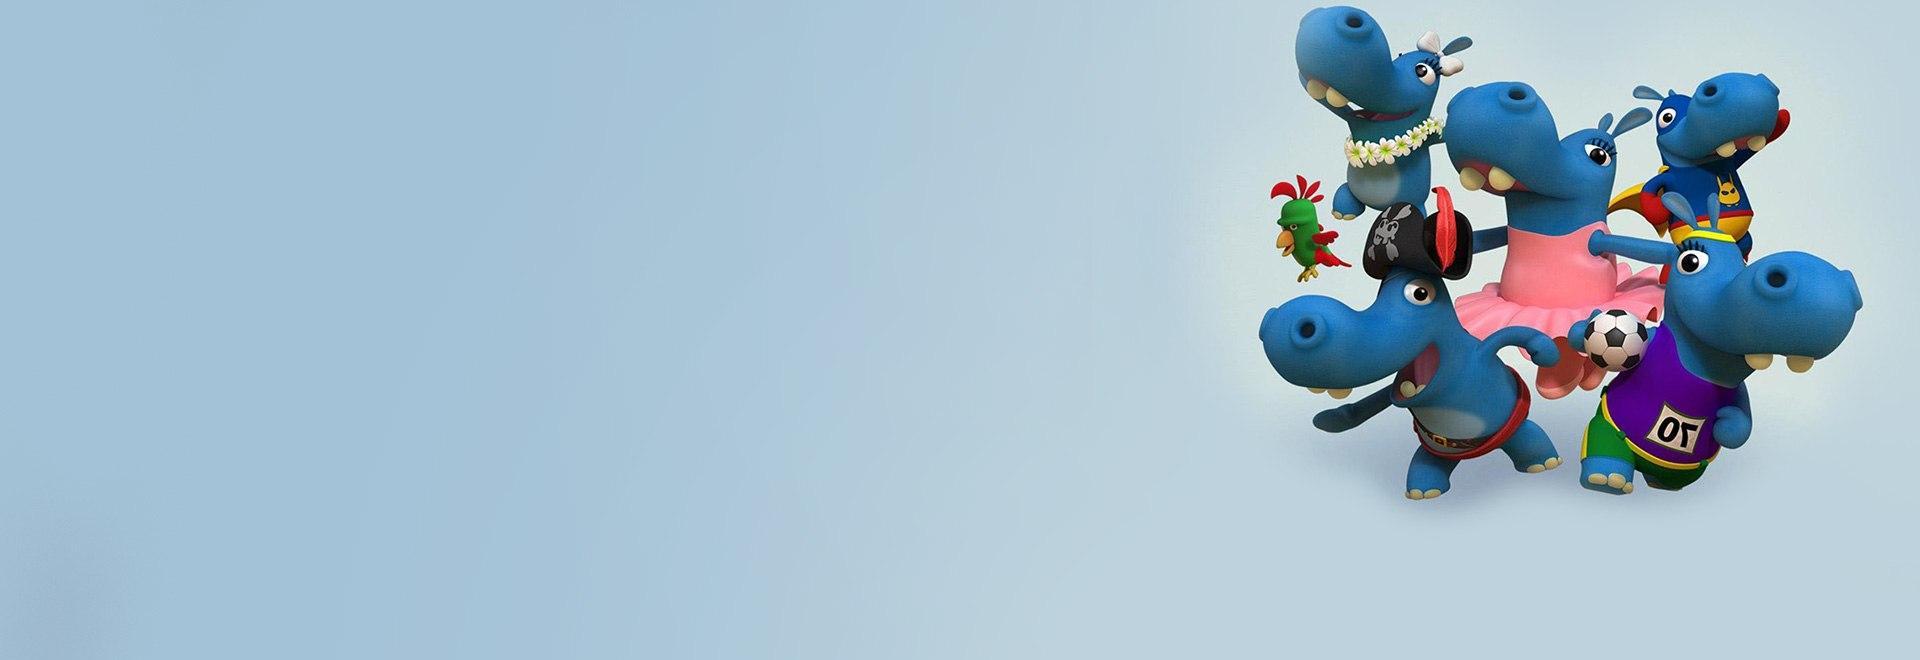 Stunt / Acrobazie con il paracadute